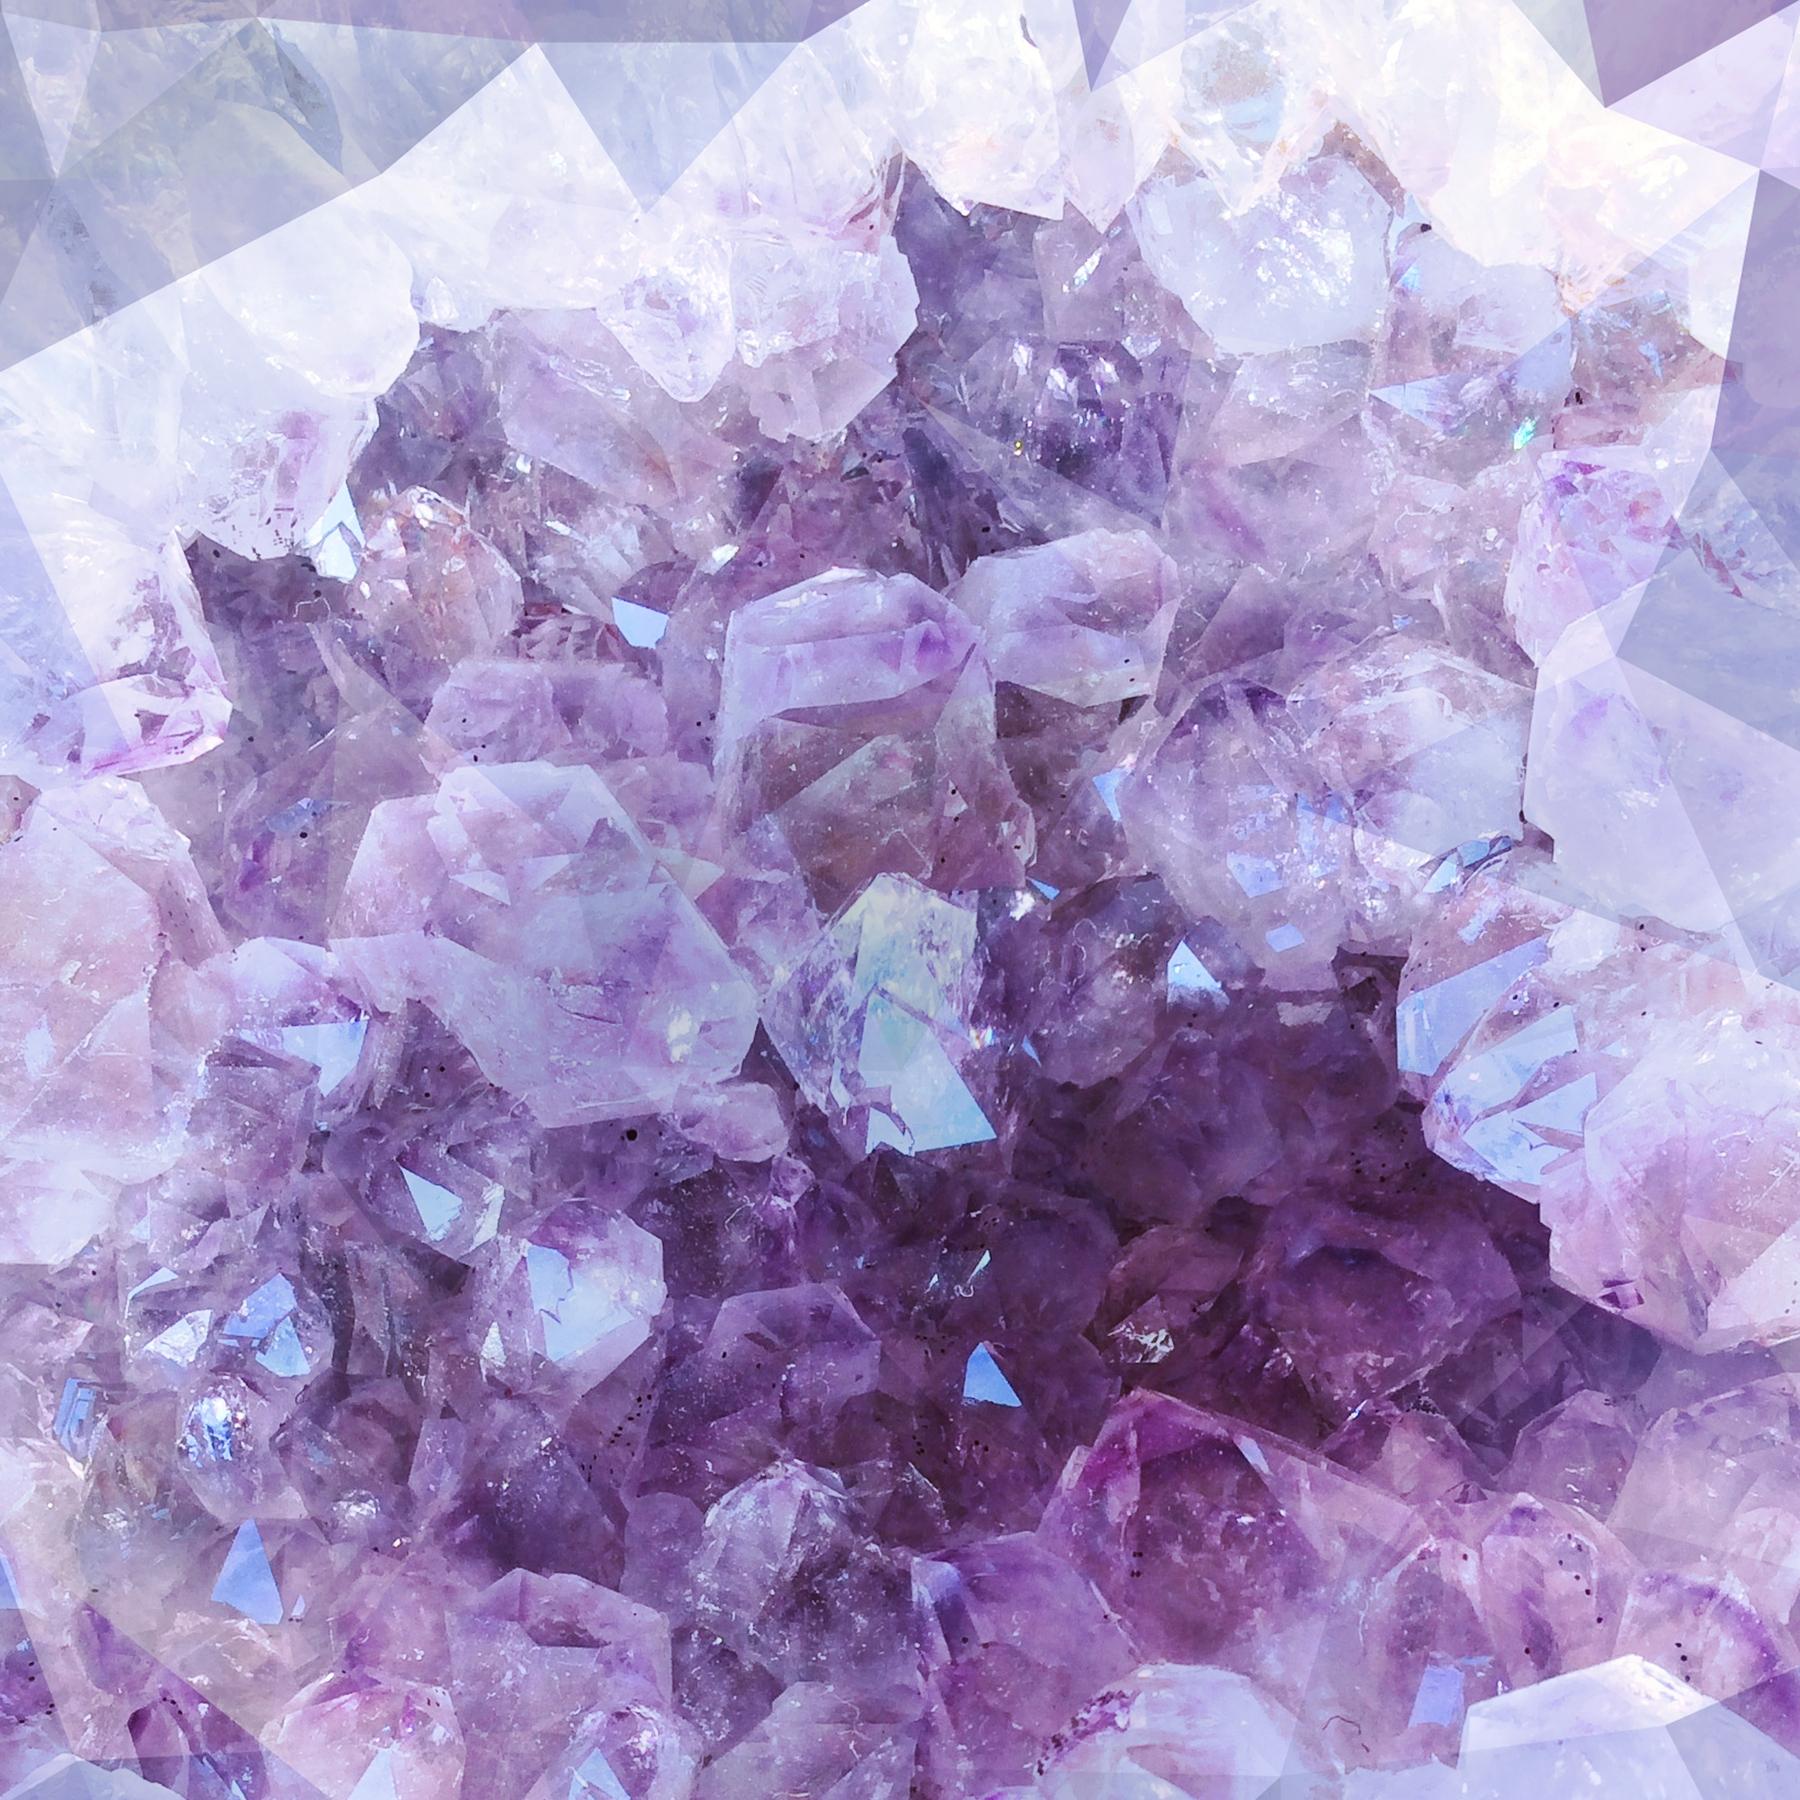 Buy Ultraviolet Crystals Wallpaper Free Shipping At Happywall Co Uk